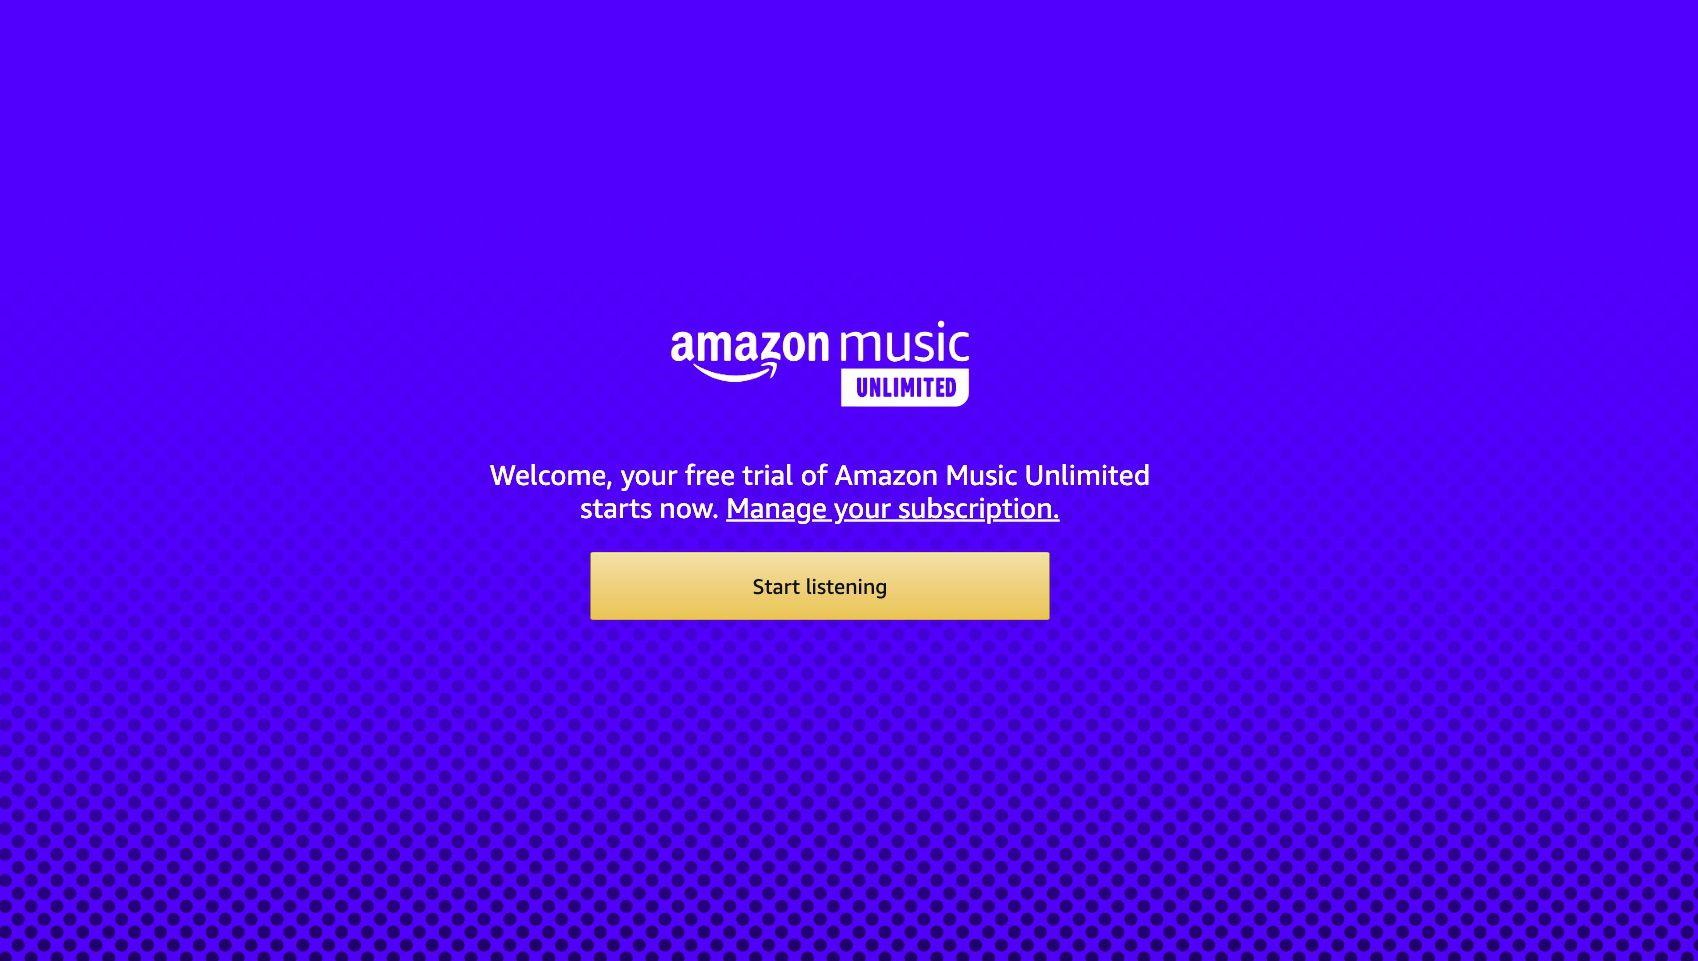 Amazon Music Unlimited website